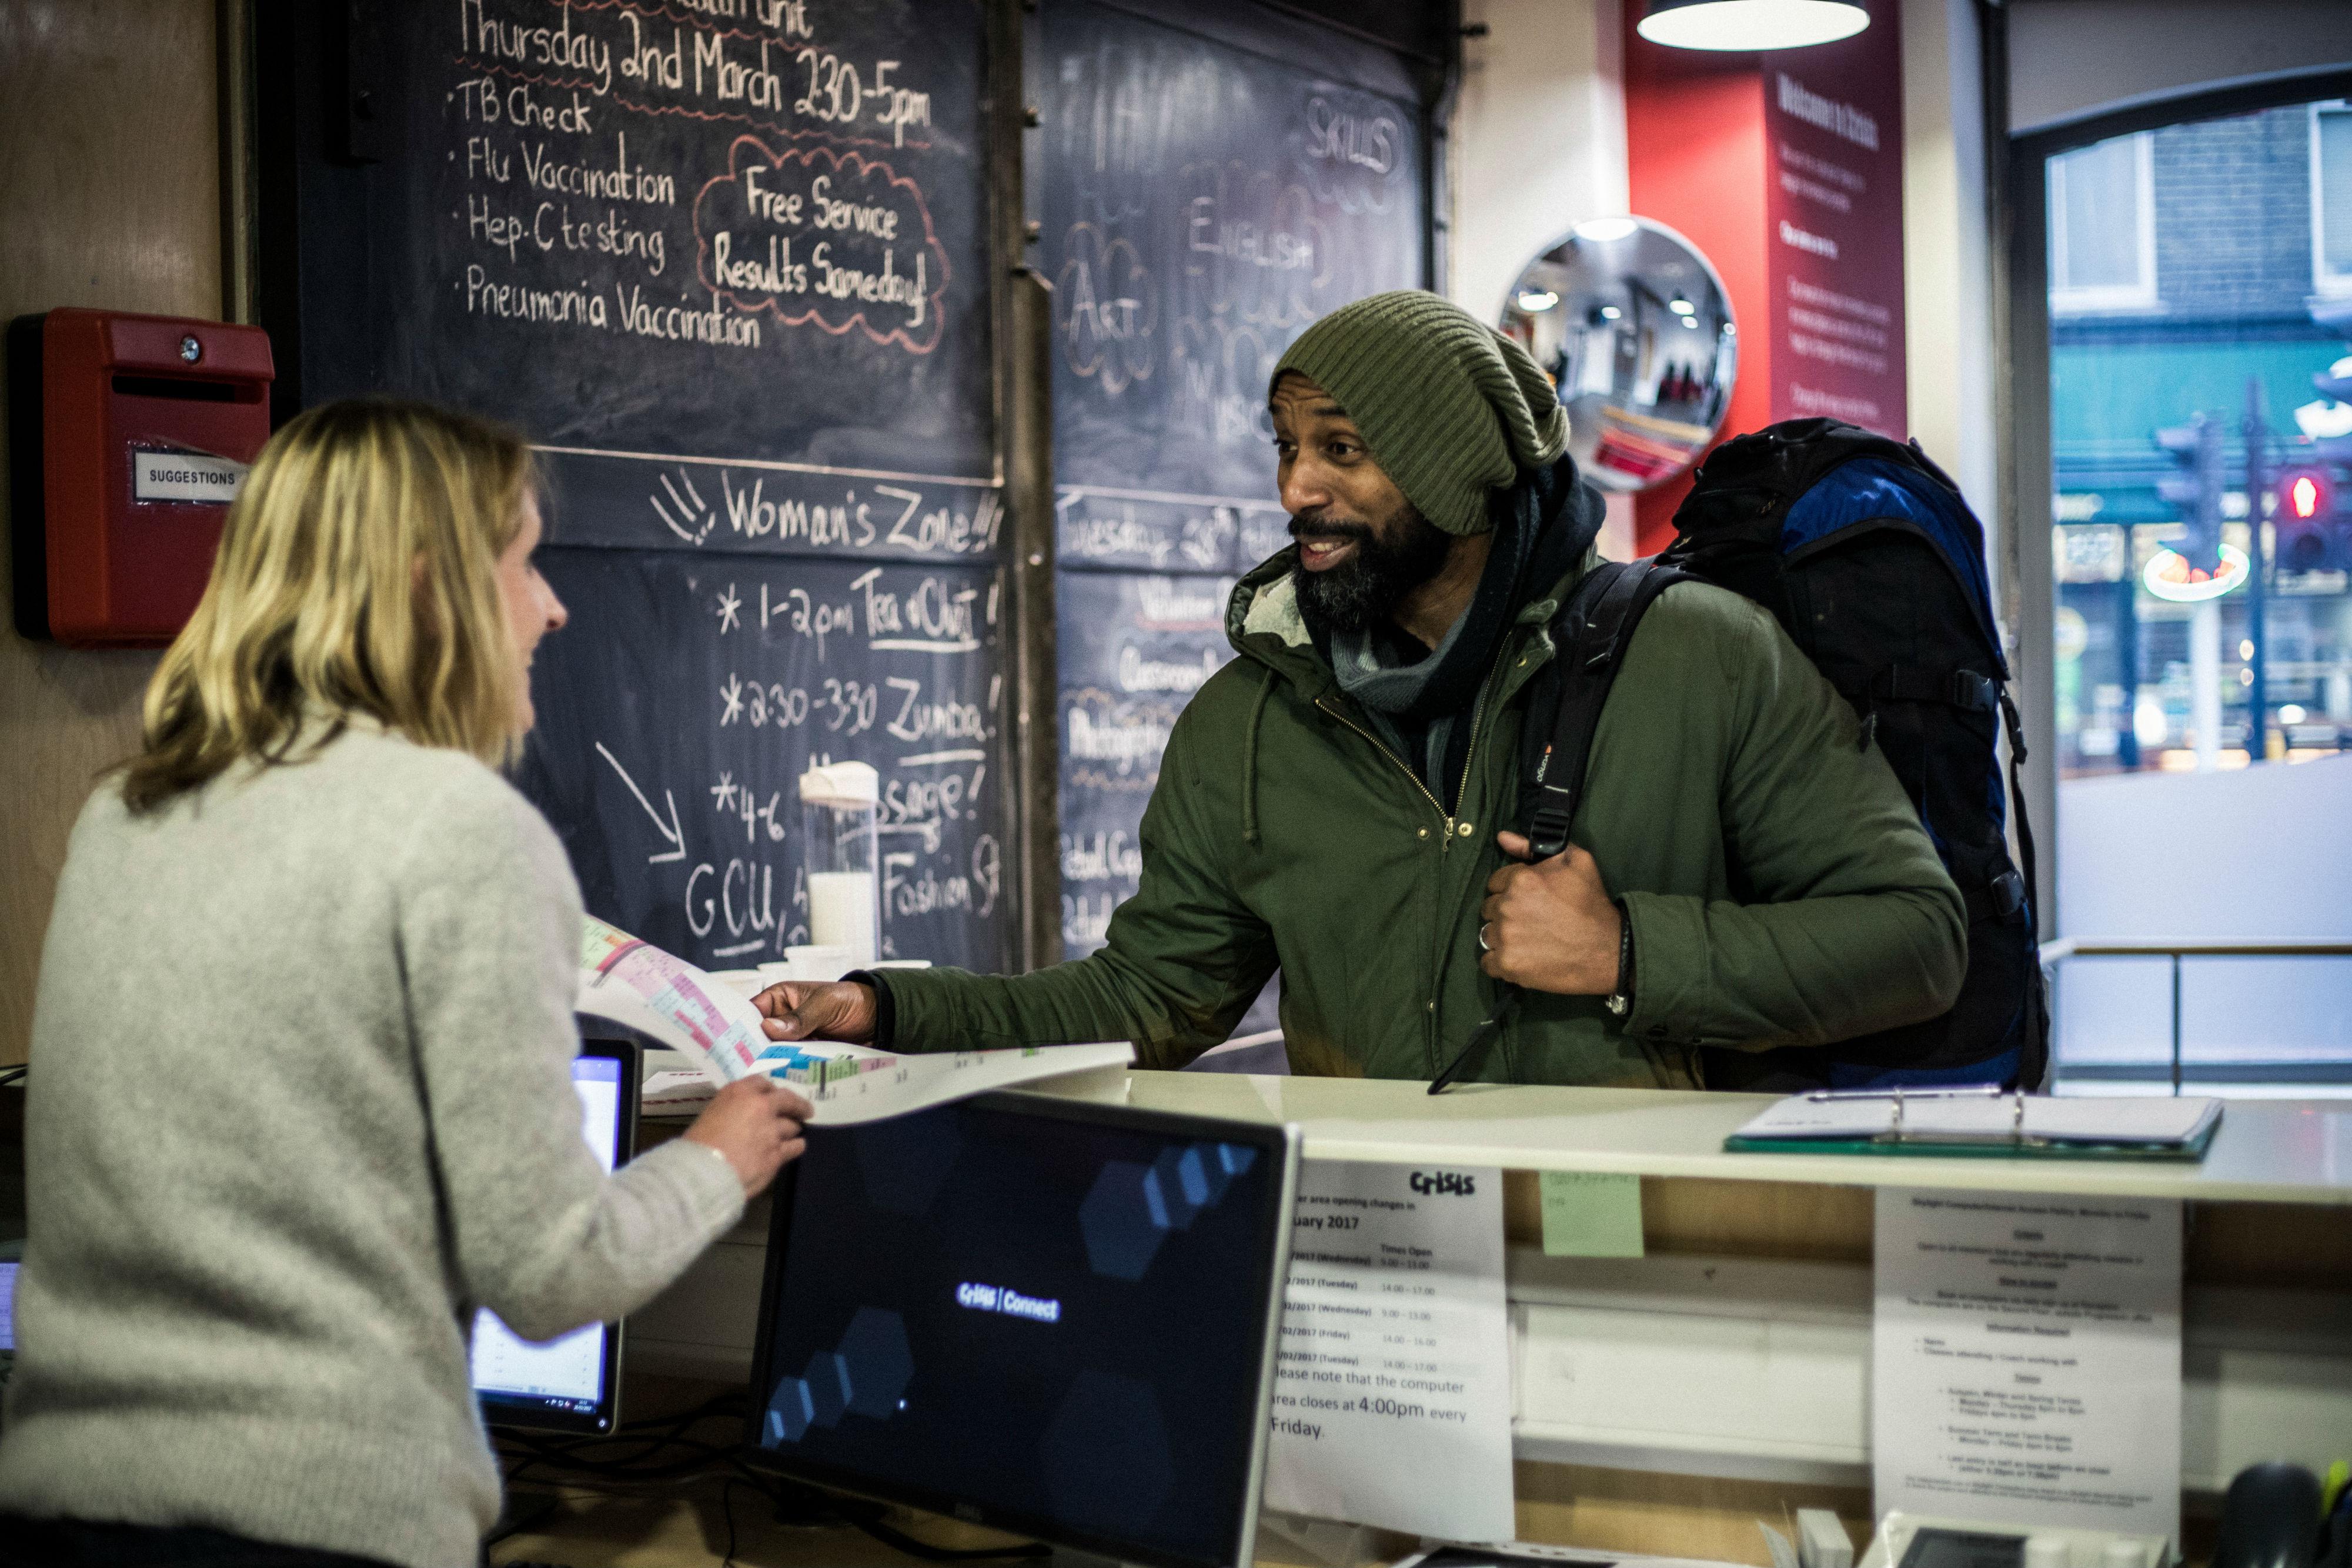 Homeless man entering Crisis charity center